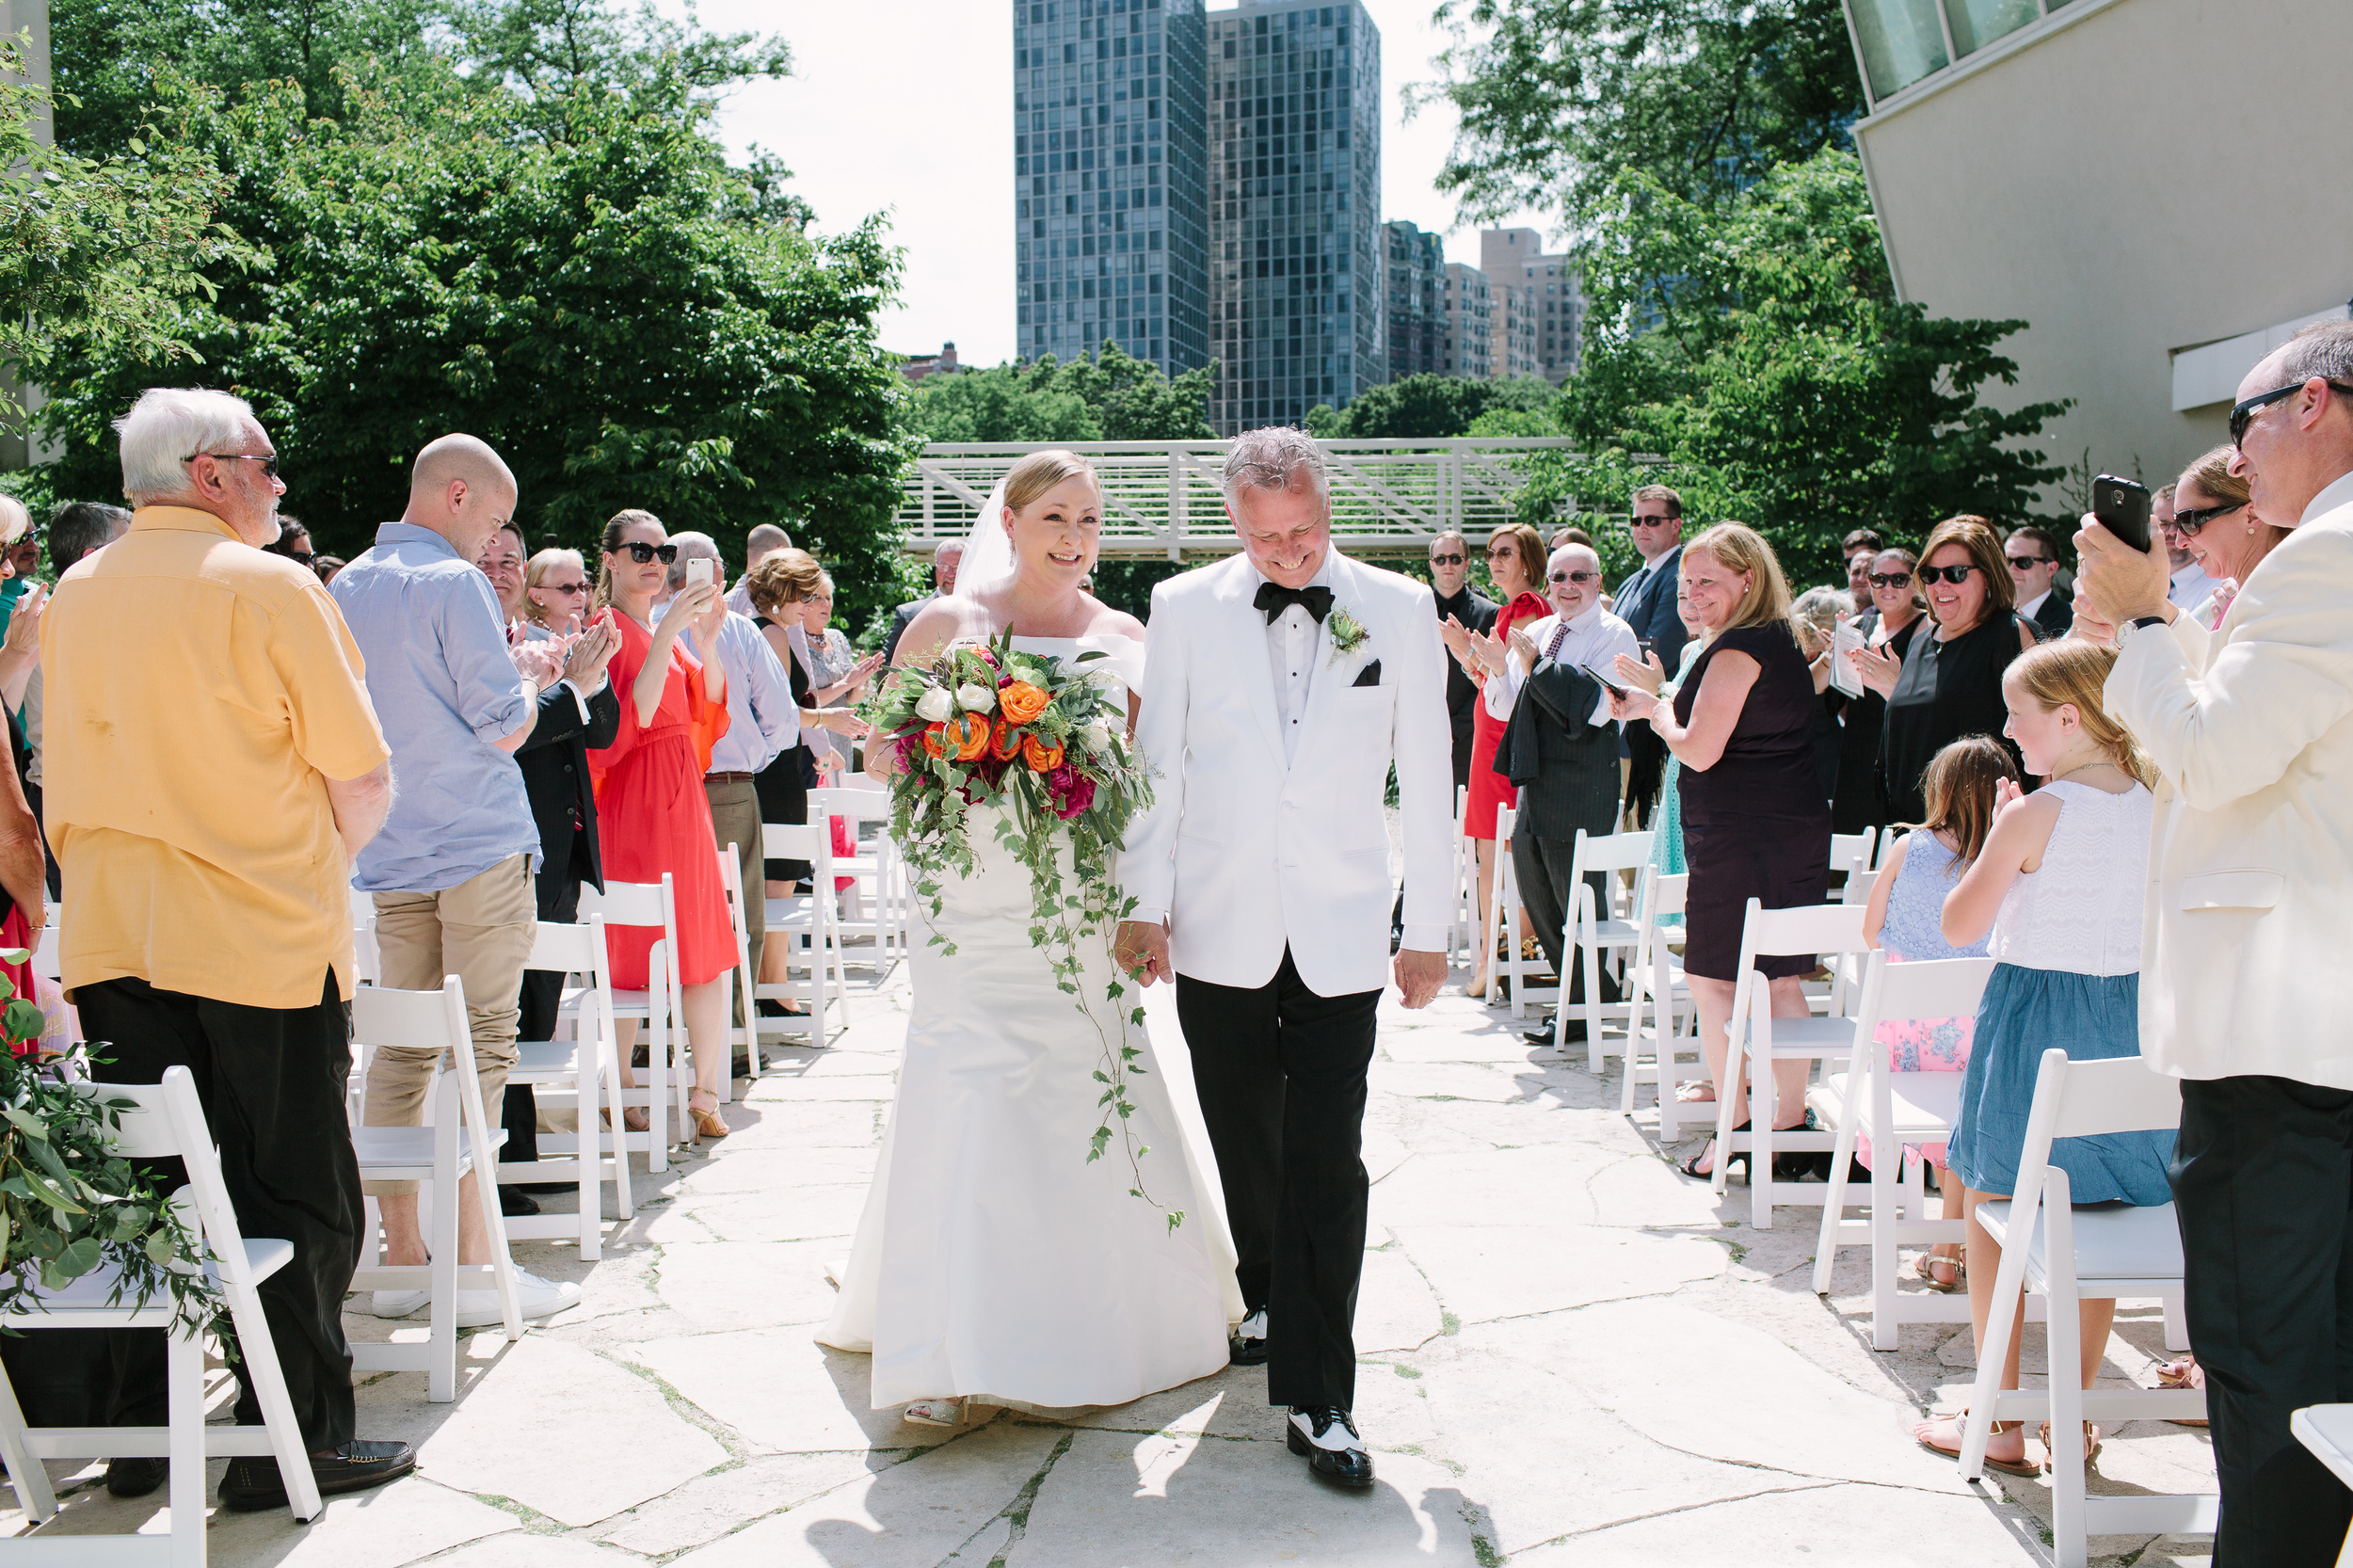 Nicodem Creative_Kokonas Wedding_North Pond Chicago-12.jpg